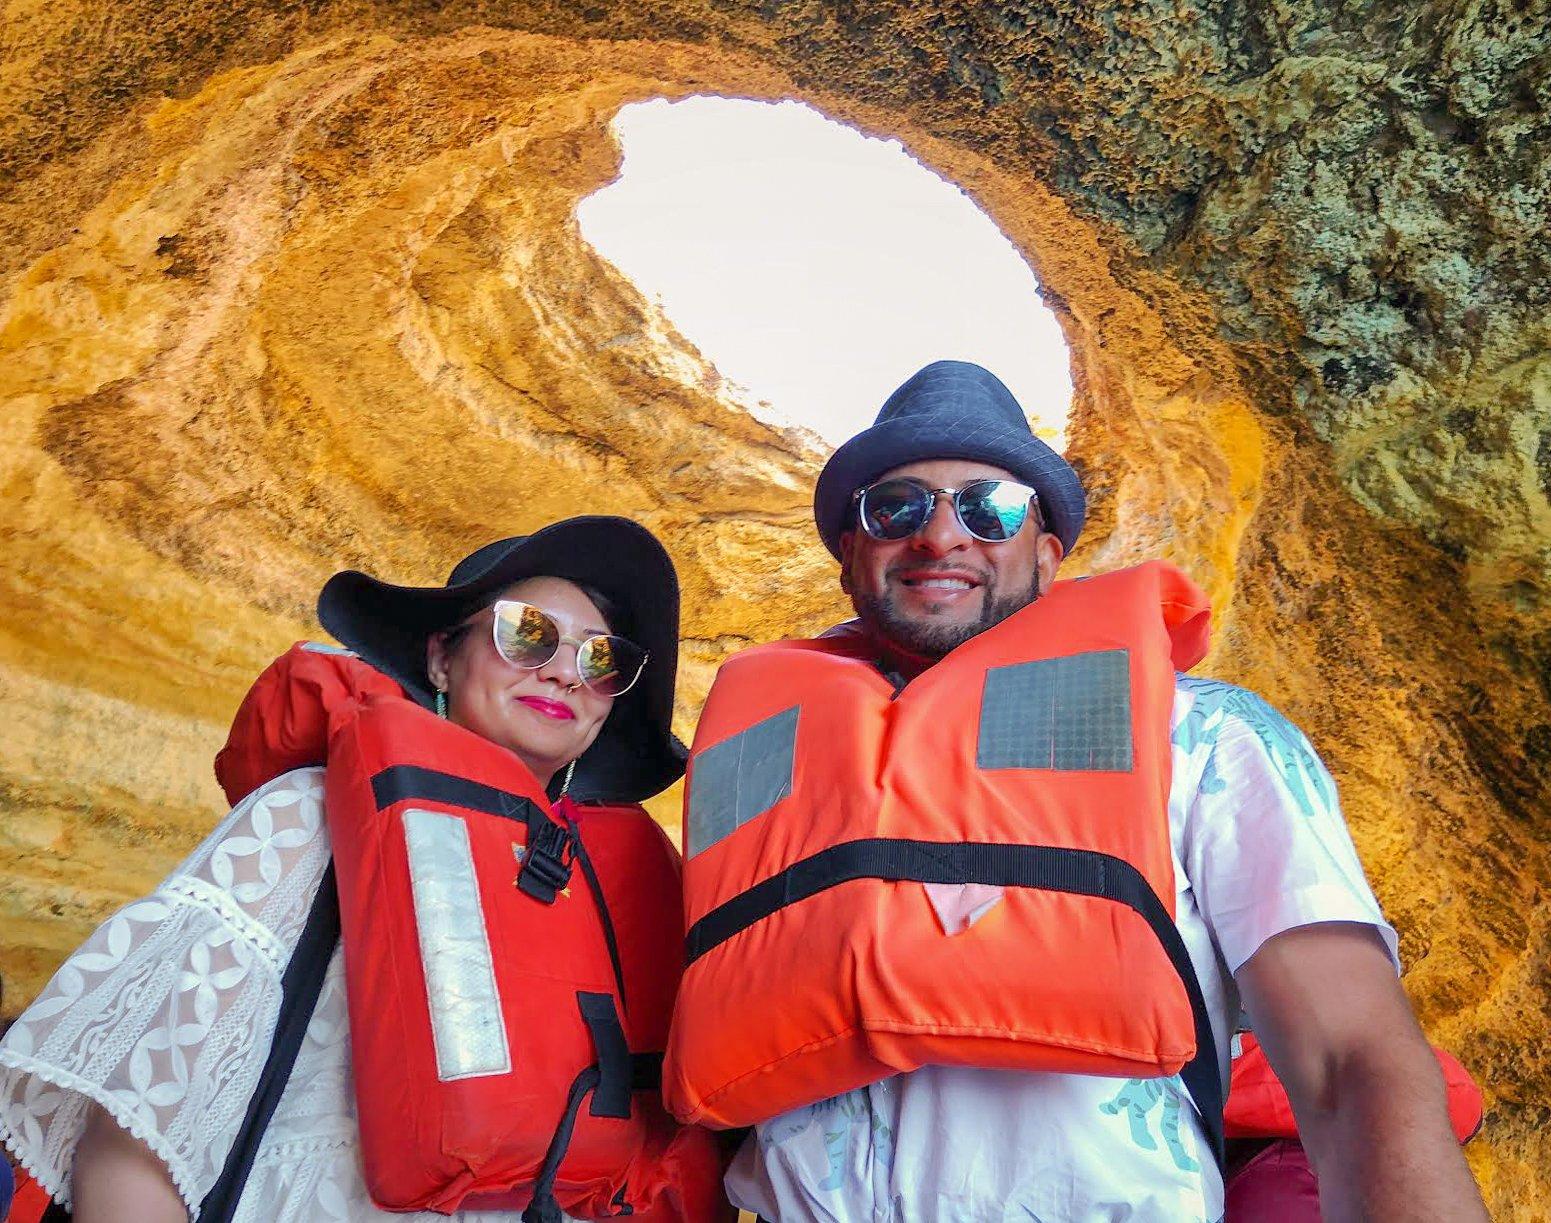 Muslim couple wearing life jackets in Benagil cave